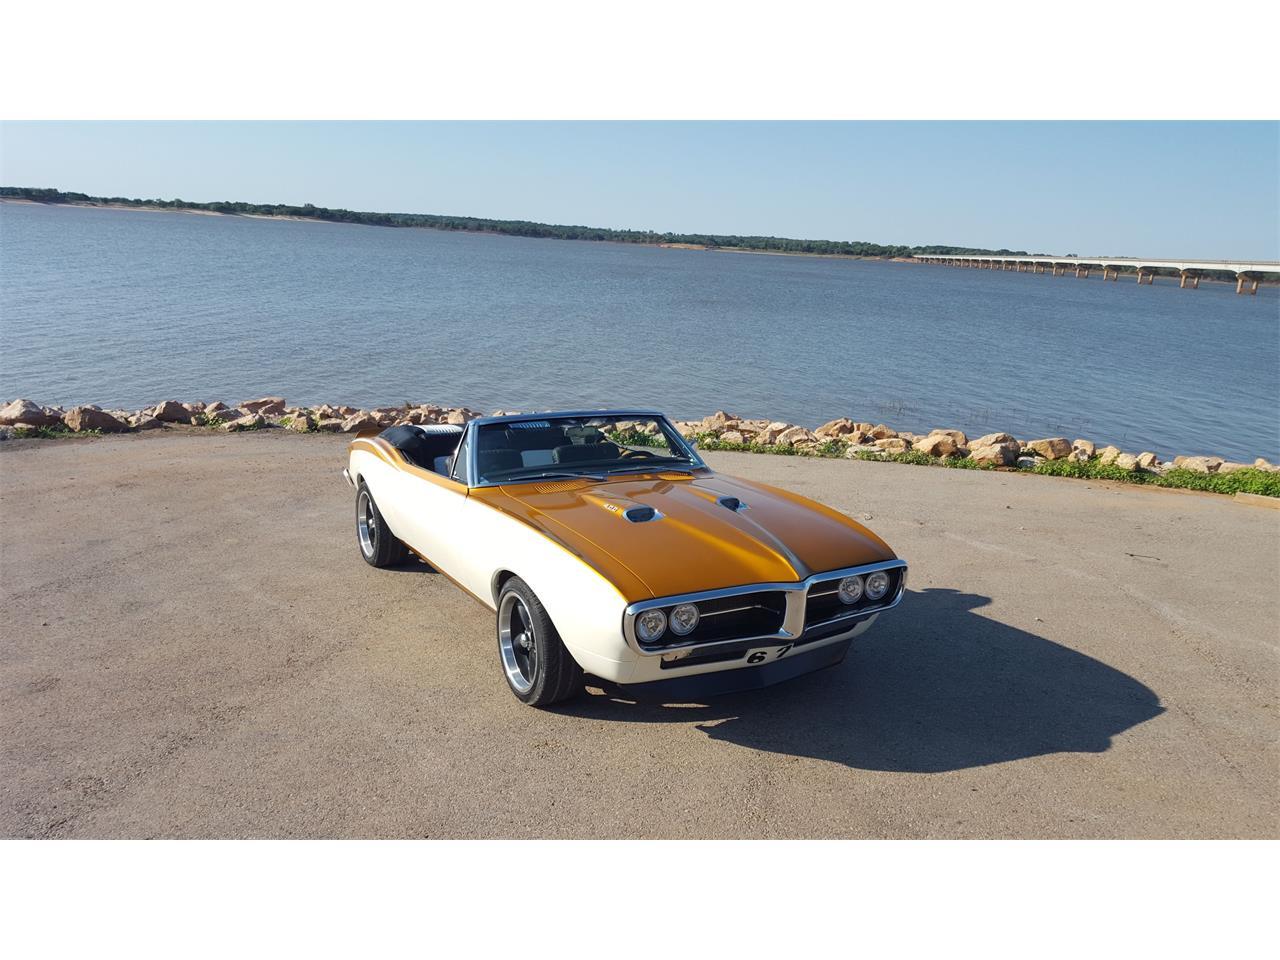 For Sale: 1967 Pontiac Firebird 400 in Gordonville, Texas